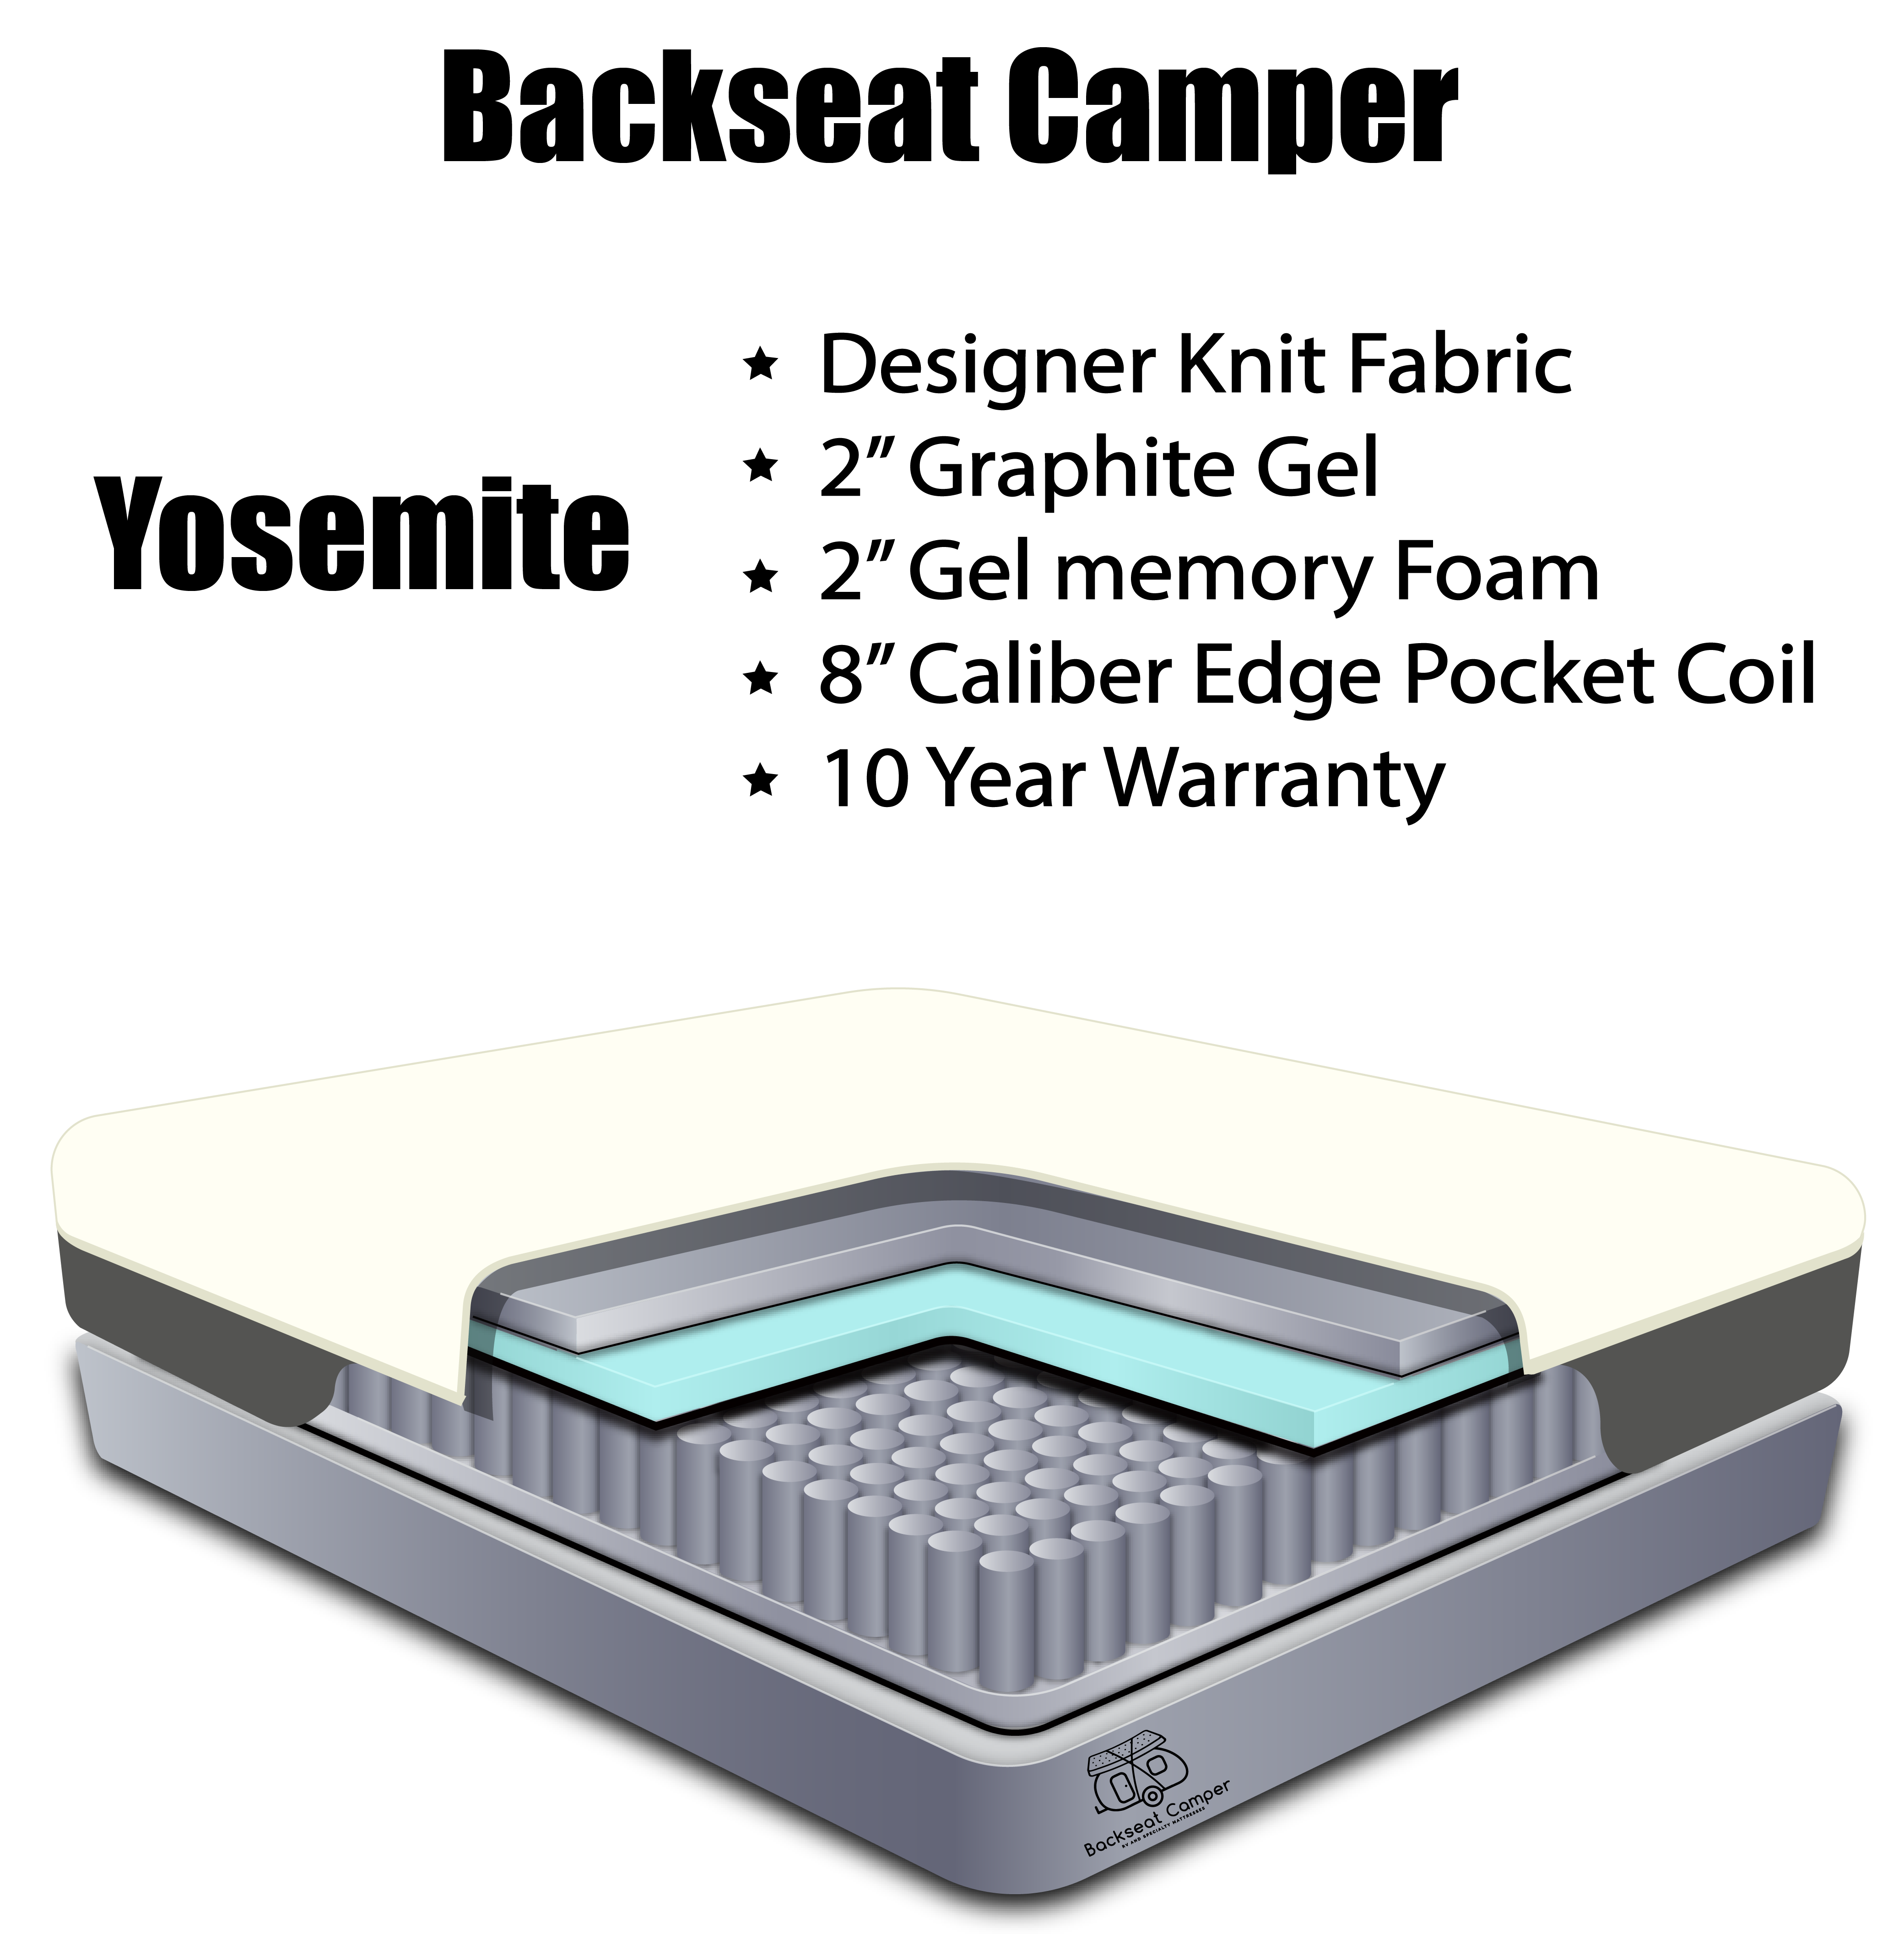 Yosemite Hybrid Rv Mattress 12 Backseat Camper